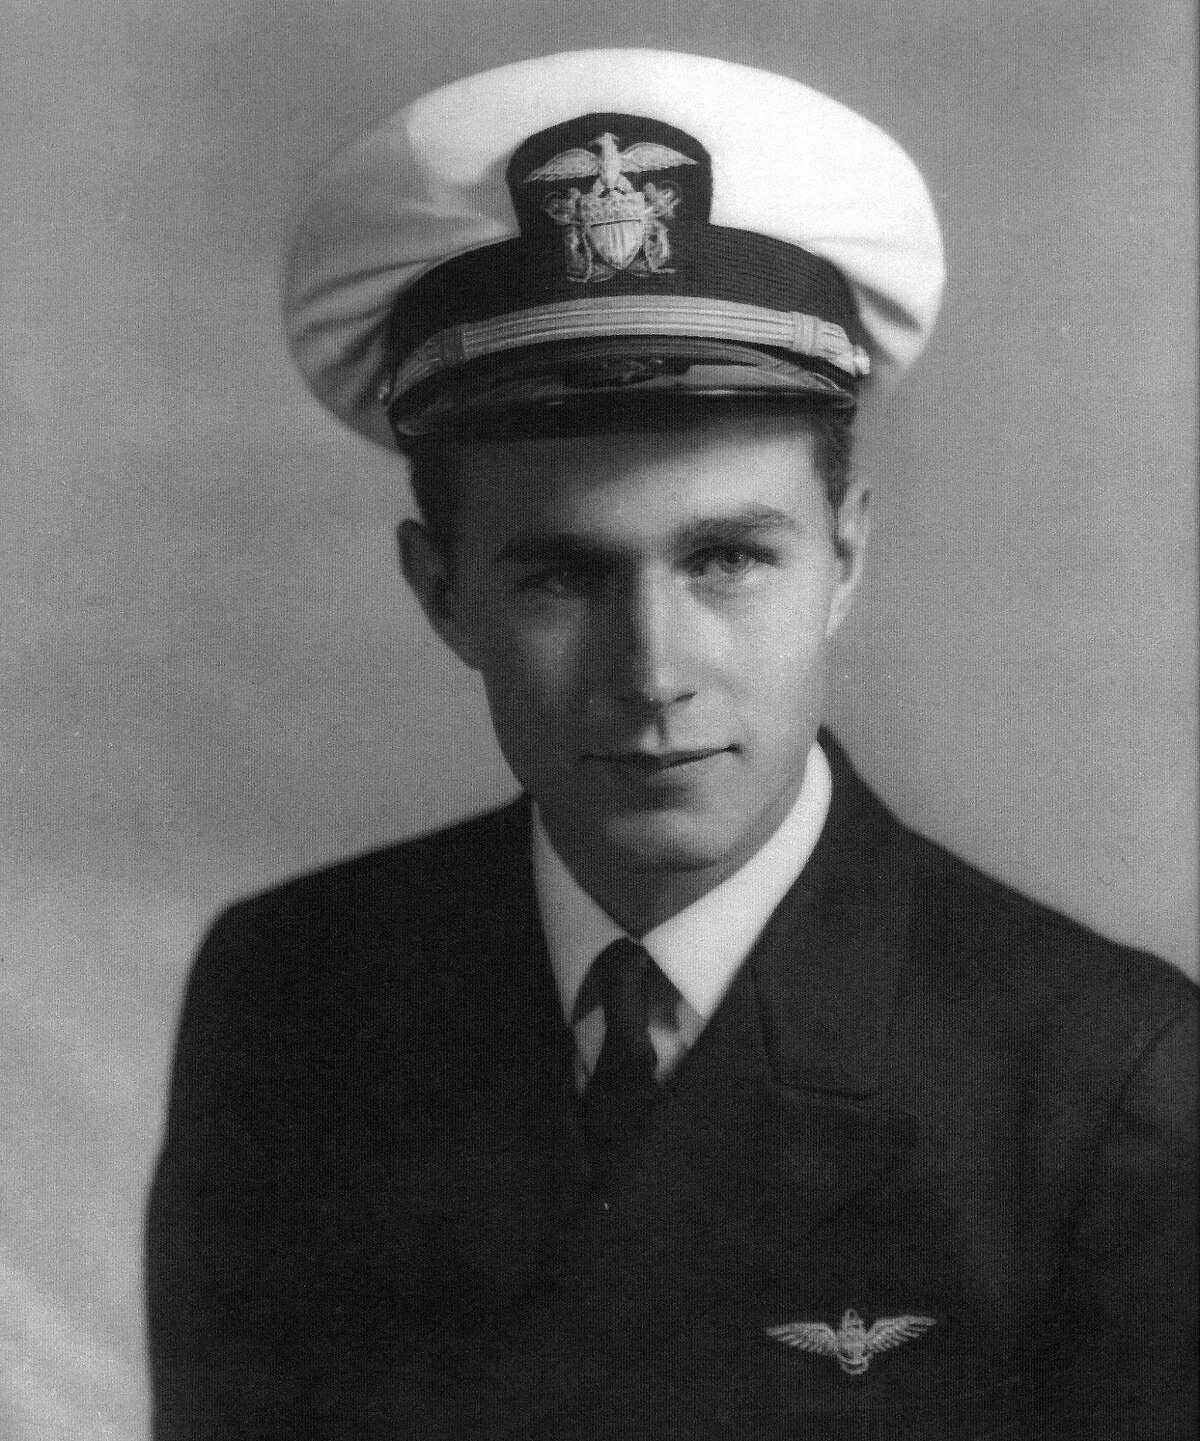 HS884 George Herbert Walker Bush, US Navy, August 1942 - September 1945 Photo Credit: George Bush Presidential Library and Museum